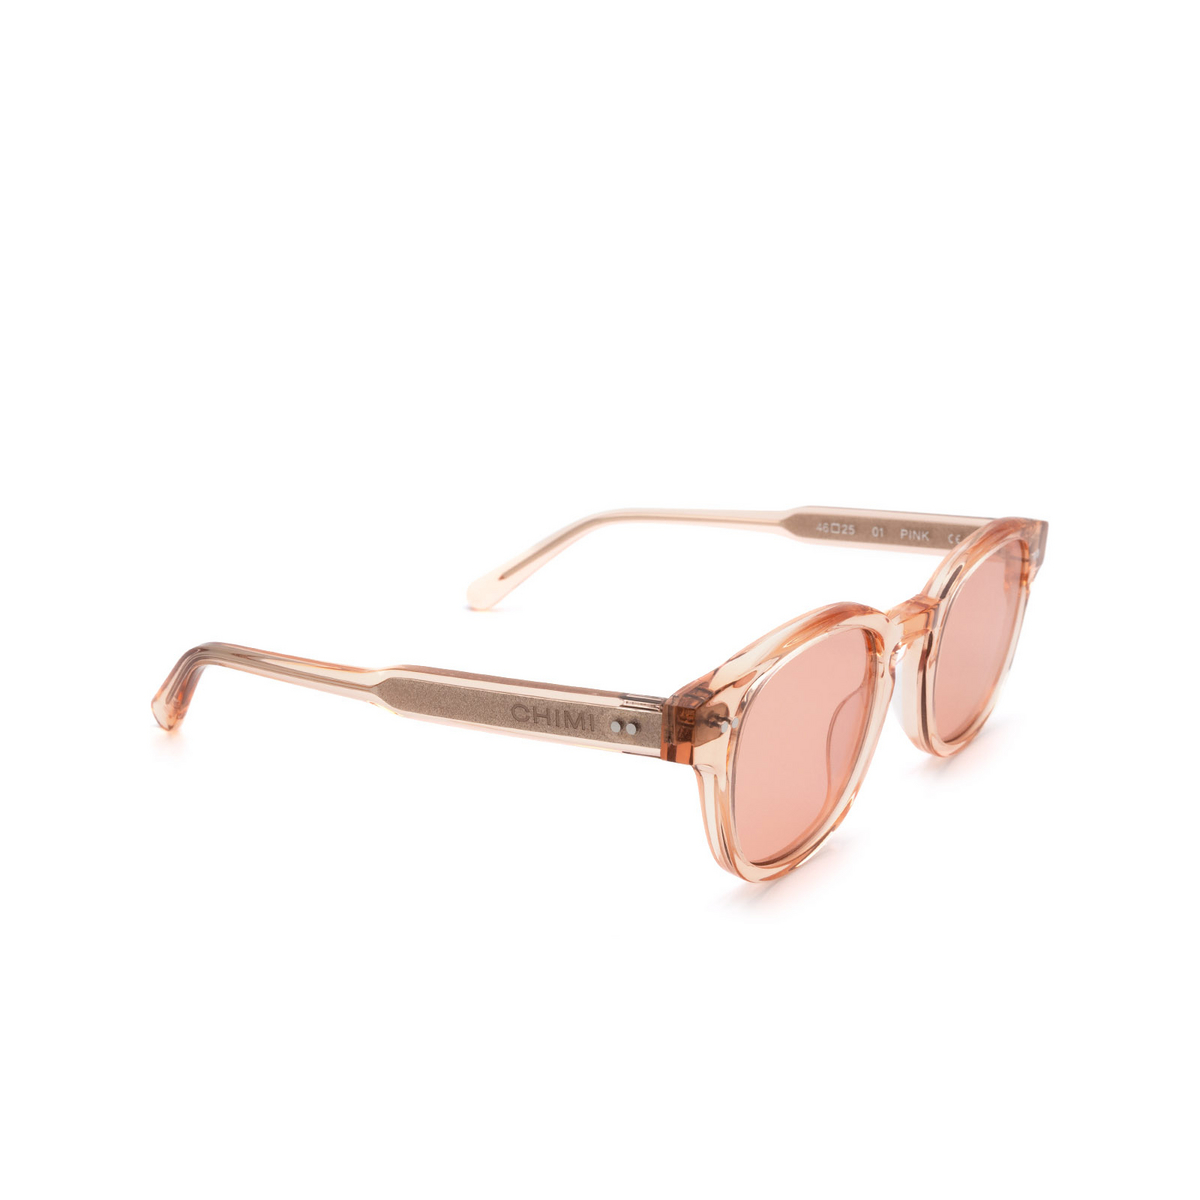 Chimi® Square Sunglasses: 01 color Pink - three-quarters view.